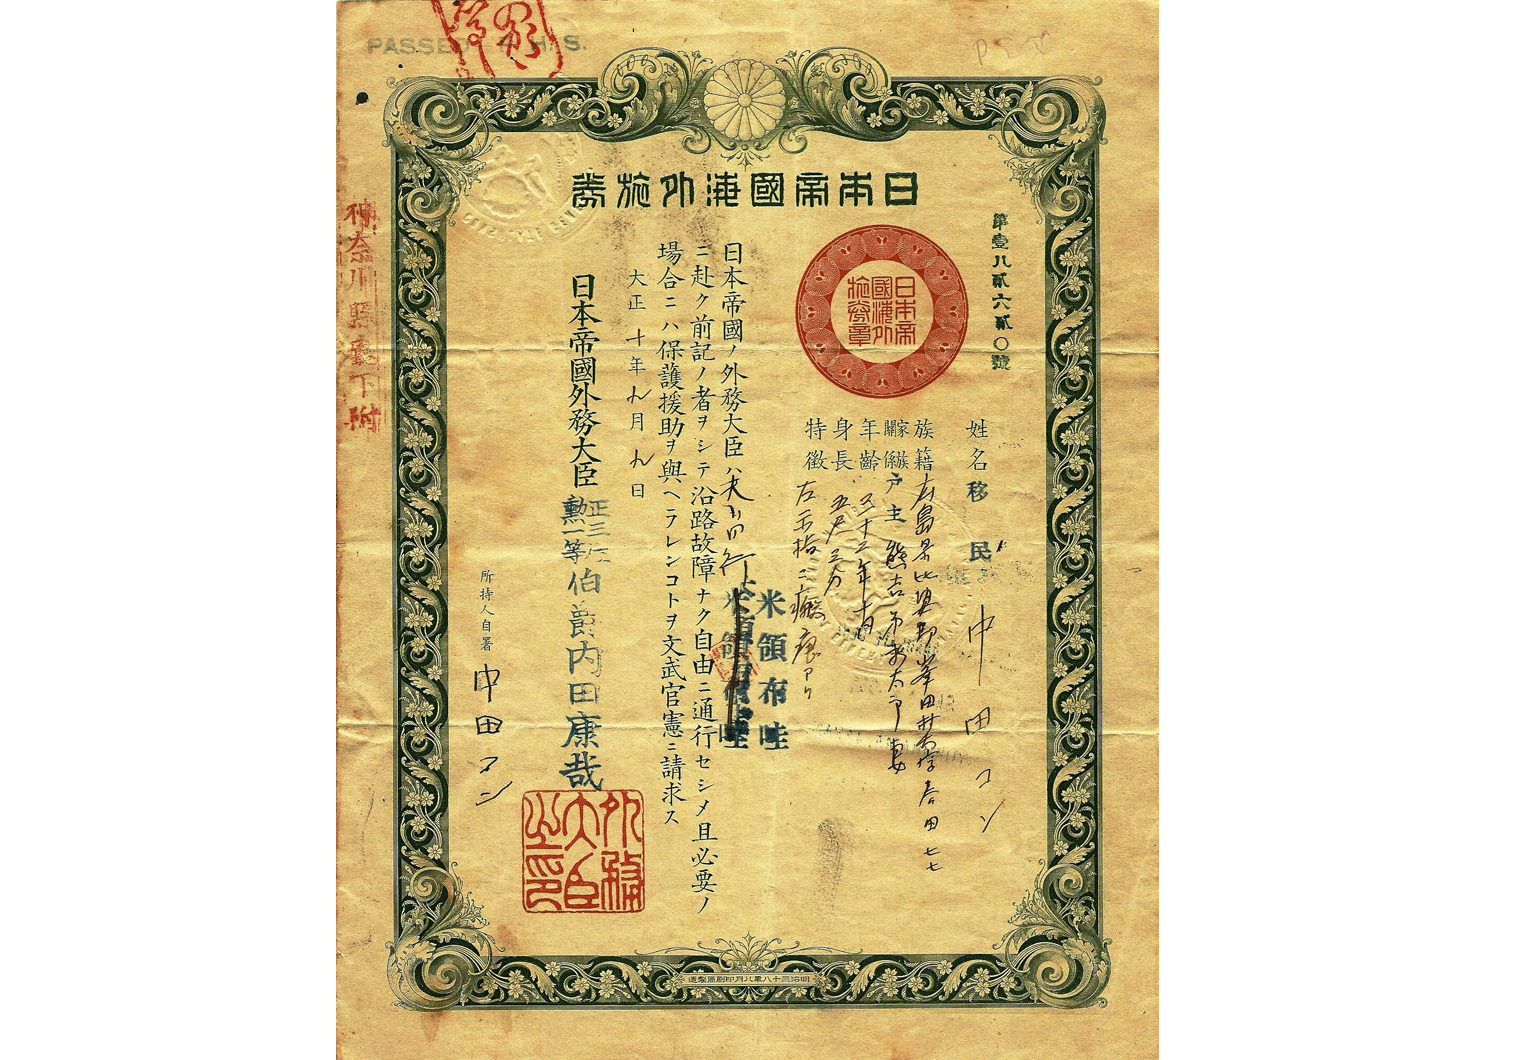 Early Japanese passport